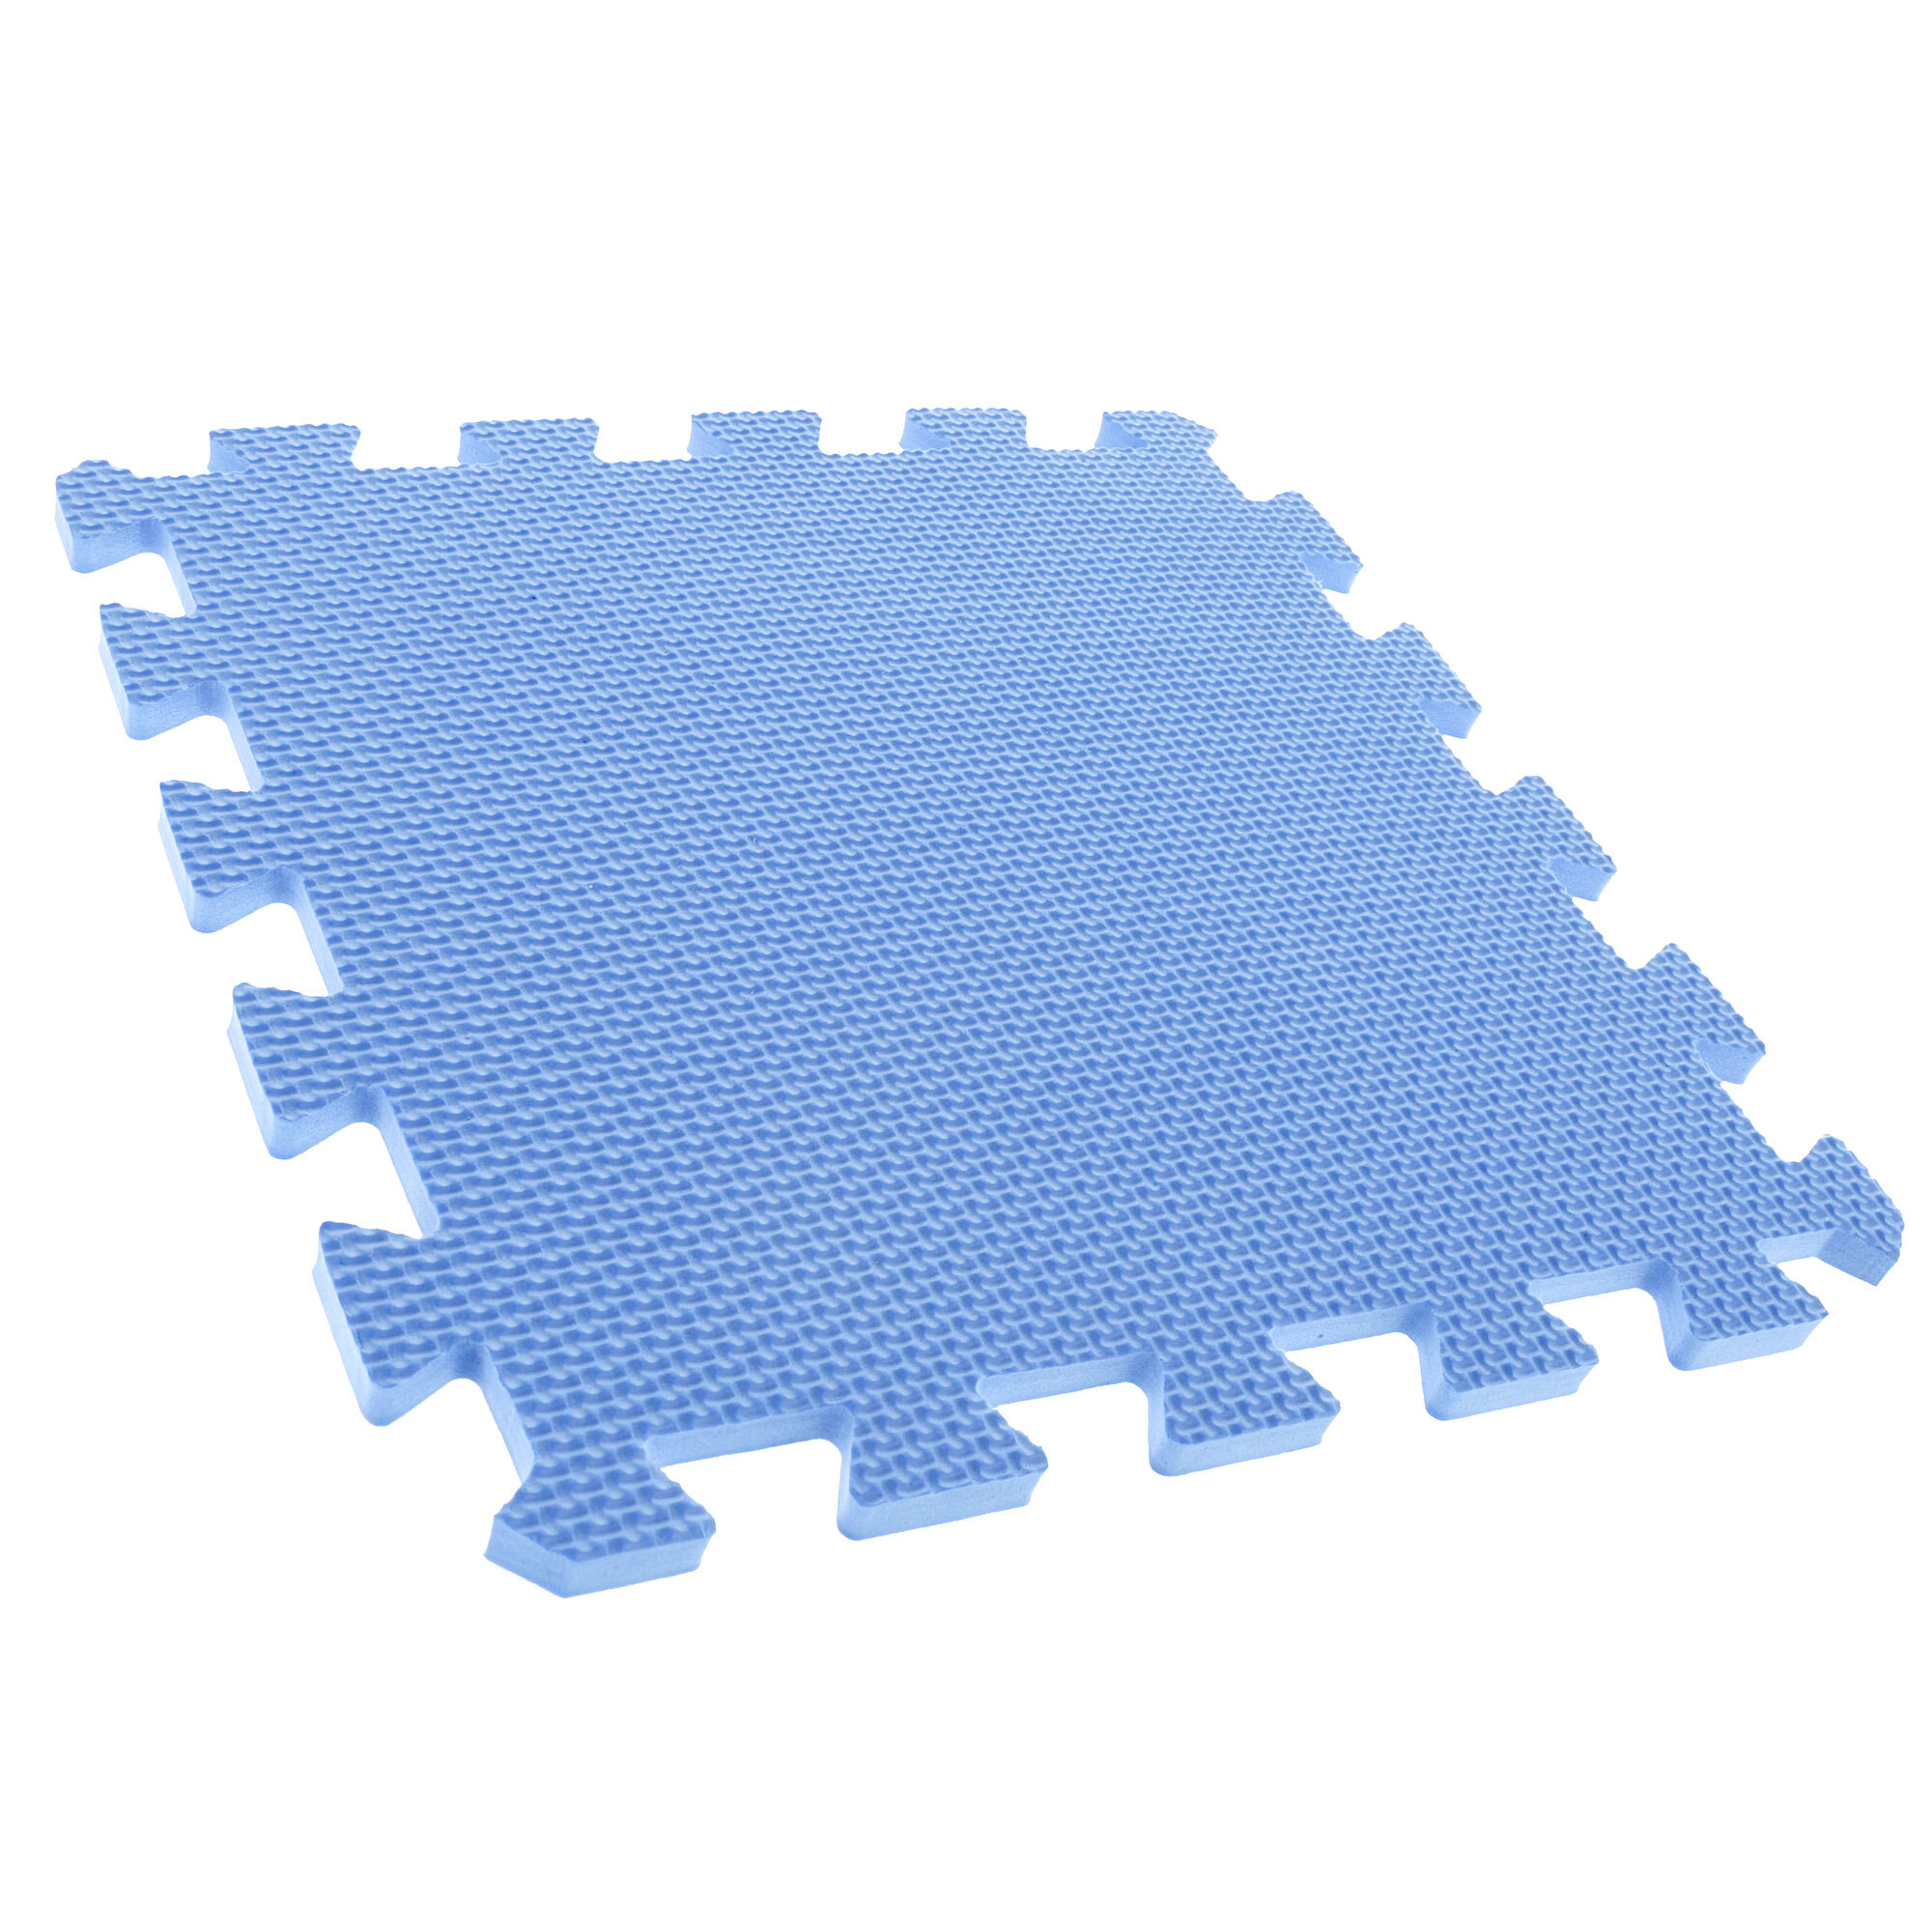 puzzle eva fm product foam alphabet number pcs mats mat